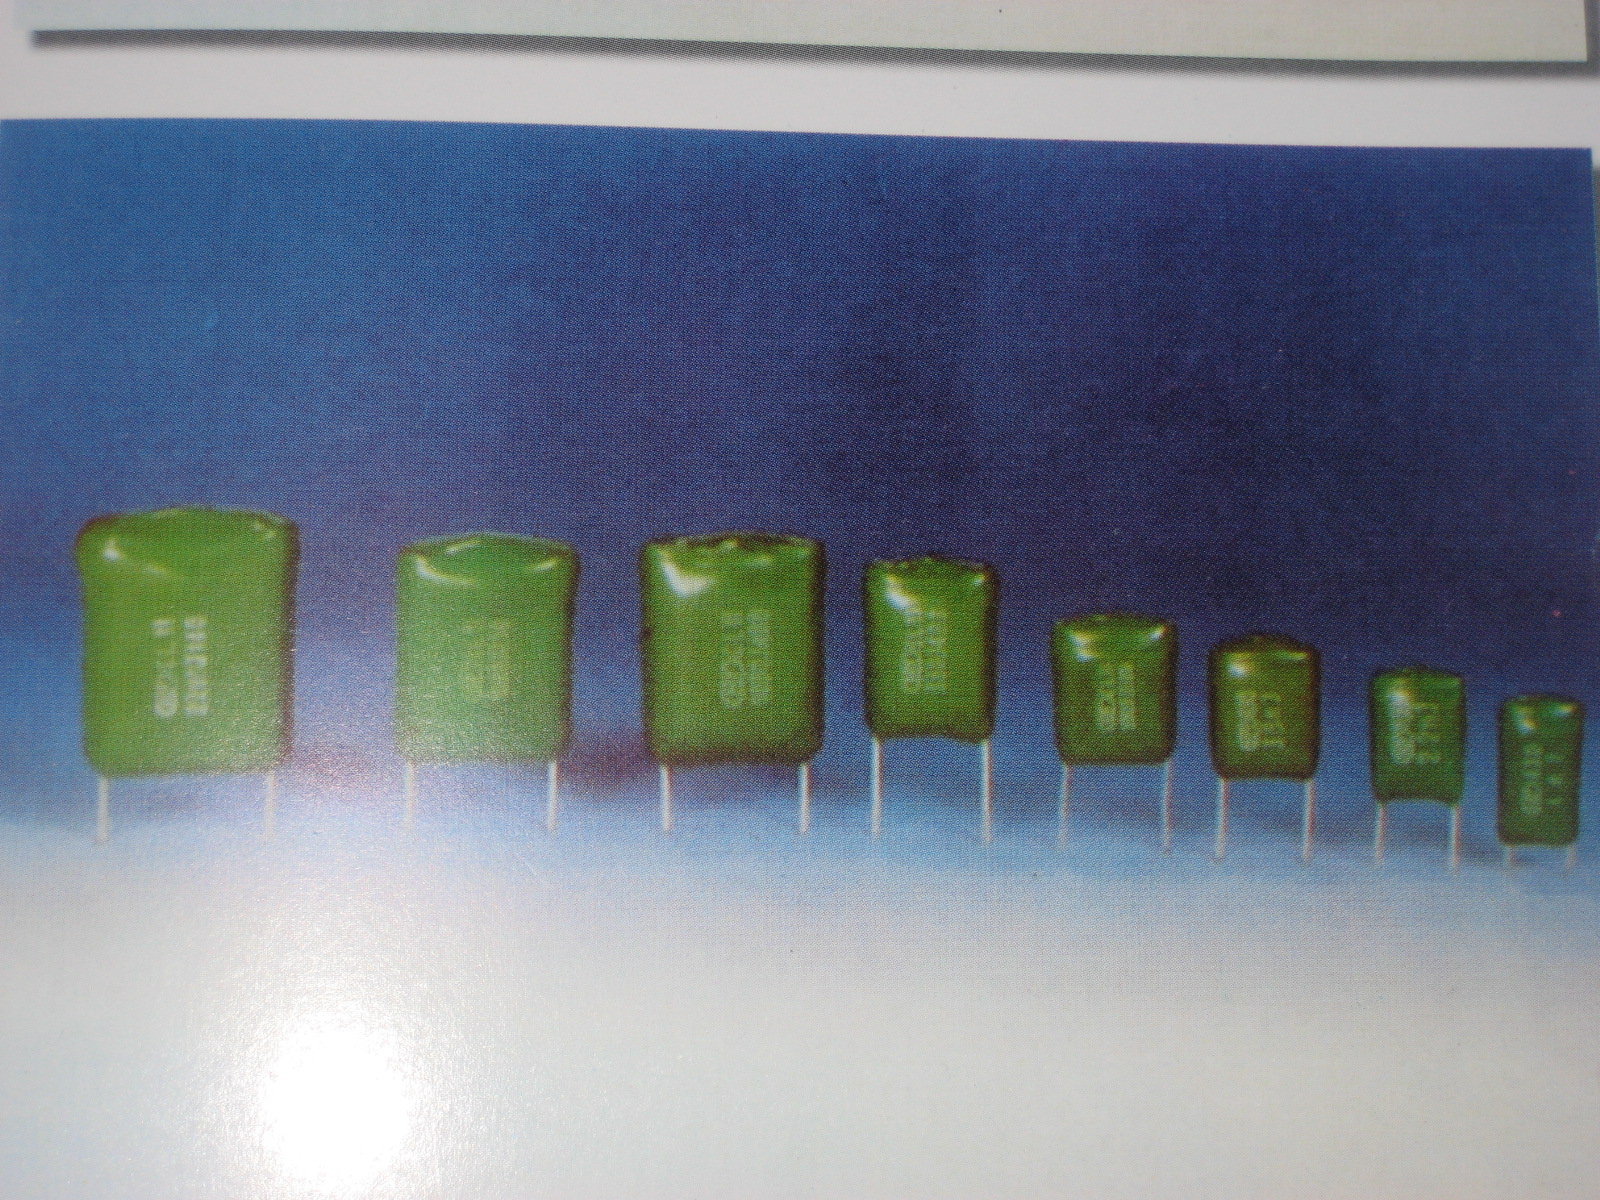 CL11聚酯膜电容器 CL11400V224 HY